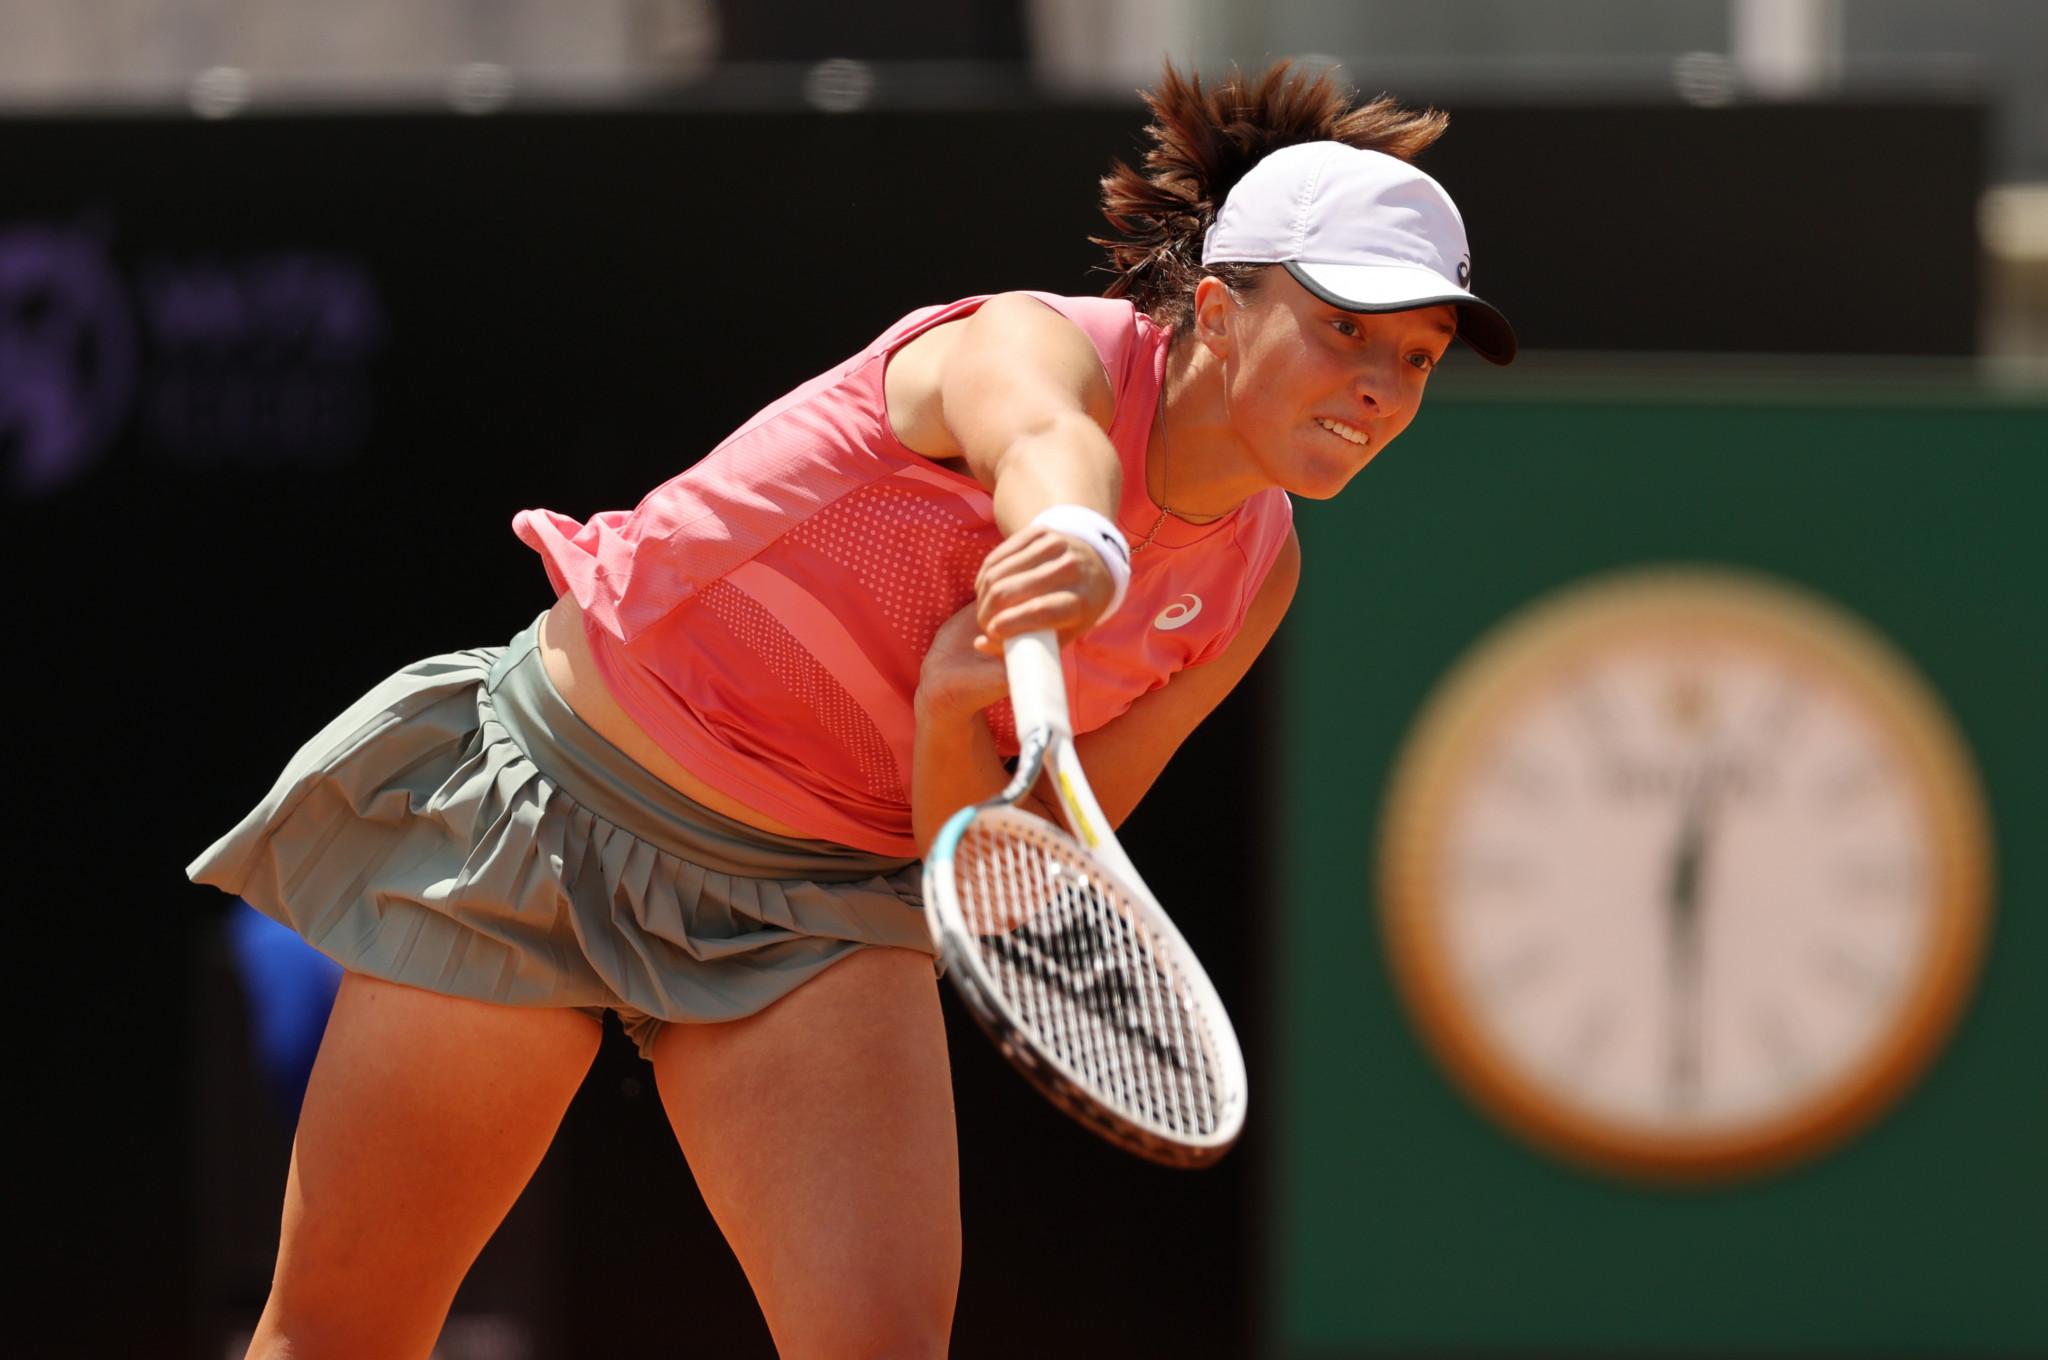 Iga Świątek of Poland reached the final of the WTA Italian Open after beating Elina Svitolina and Karolina Pliskova in Rome today ©Getty Images